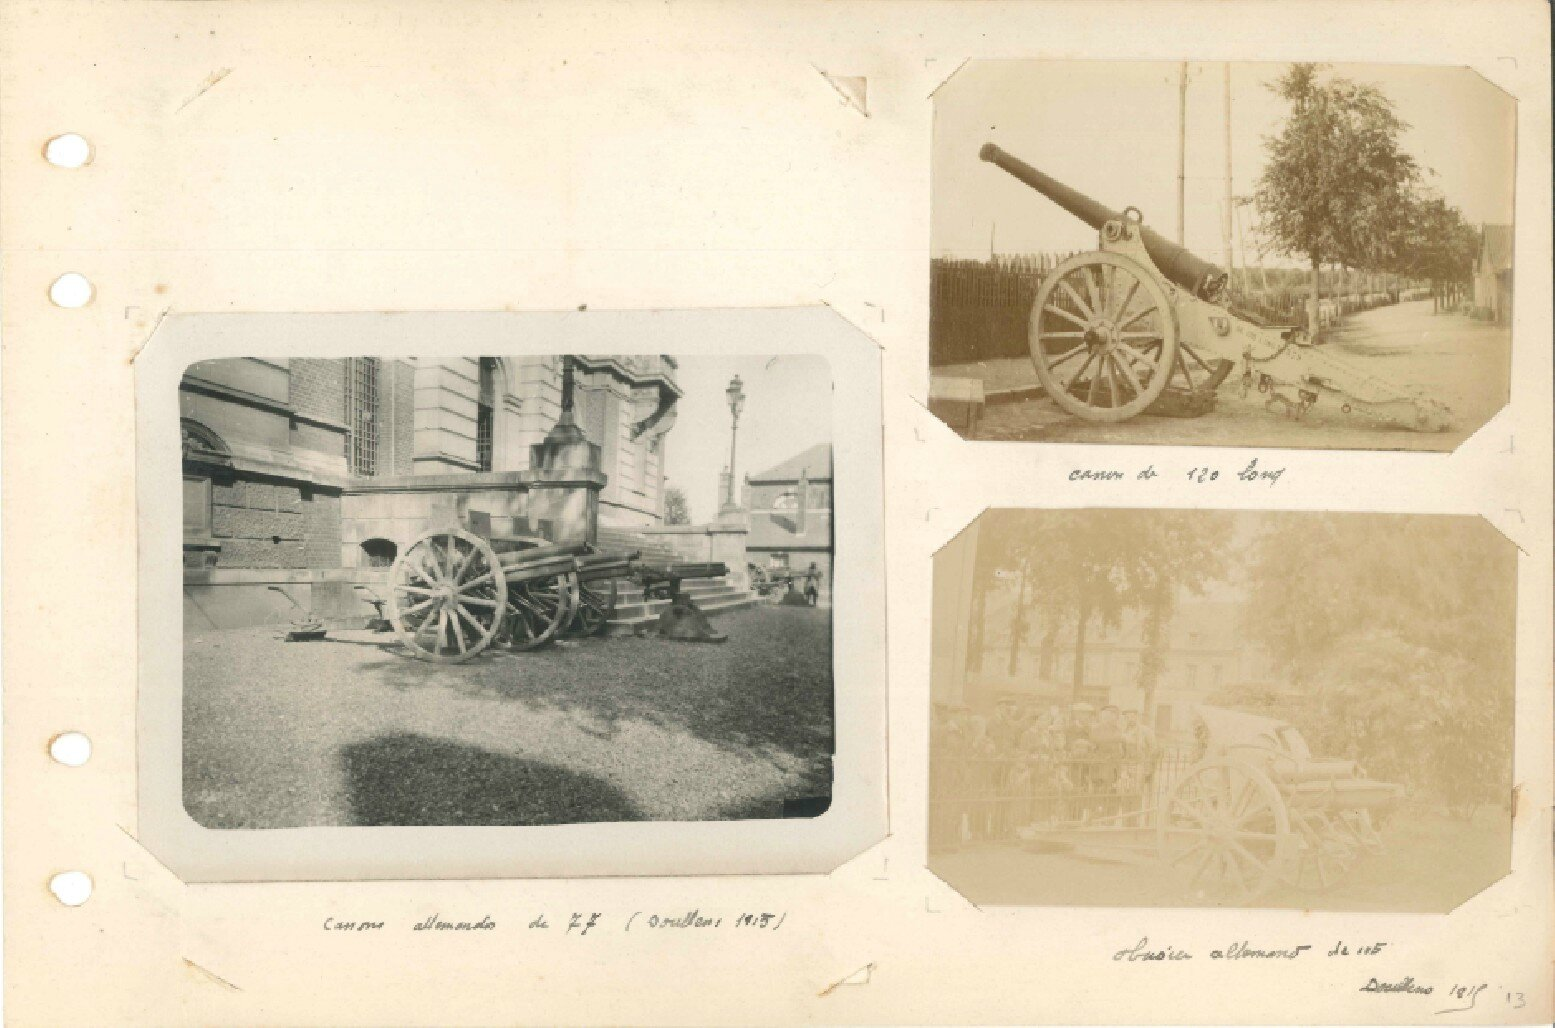 p.013 - Artillerie allemande